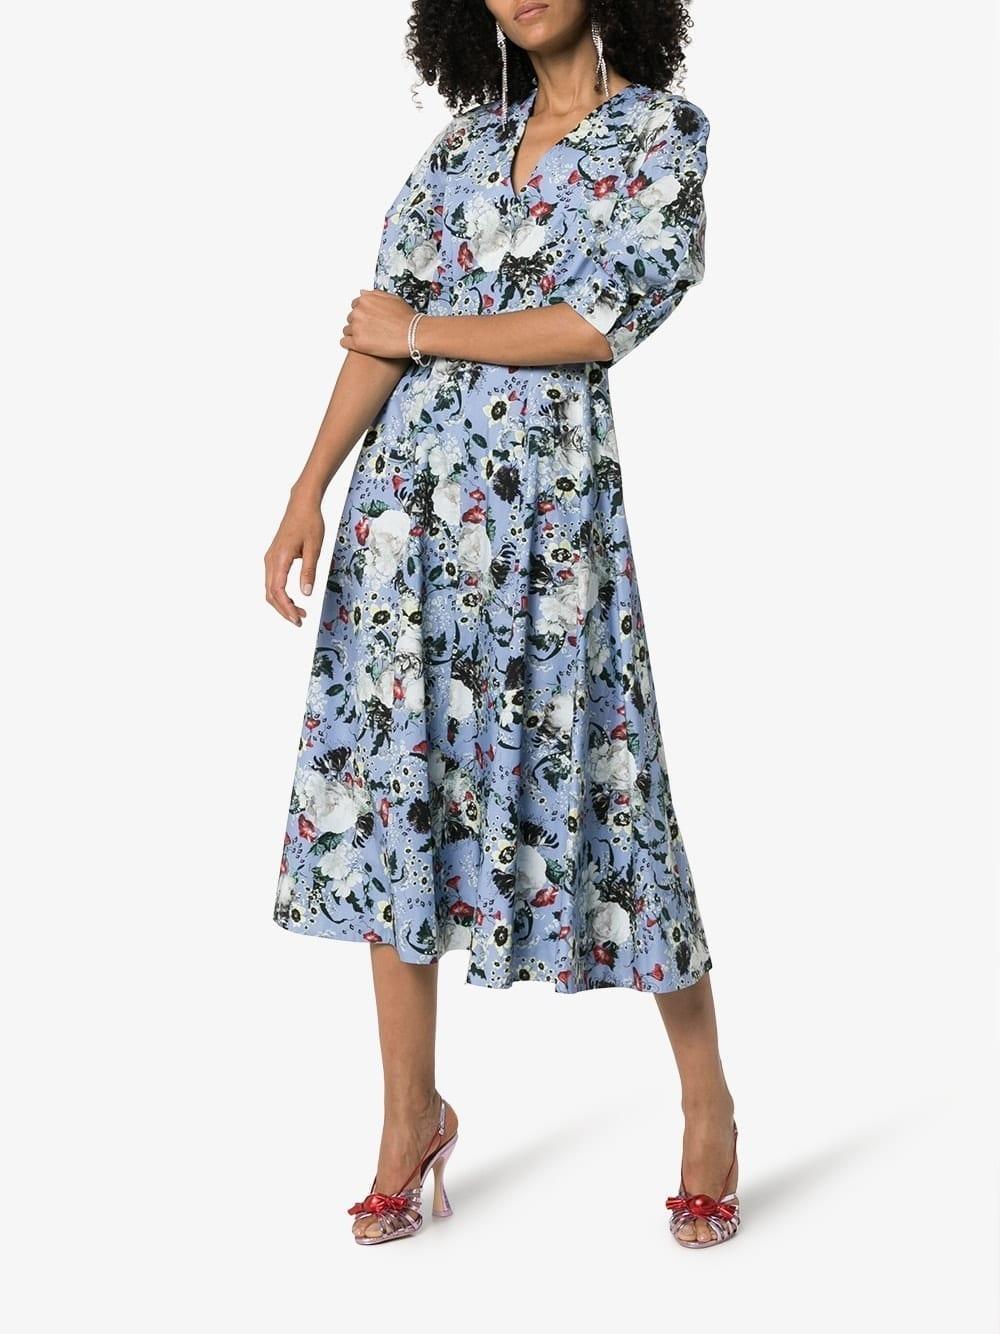 ERDEM Cressida Floral Midi Dress